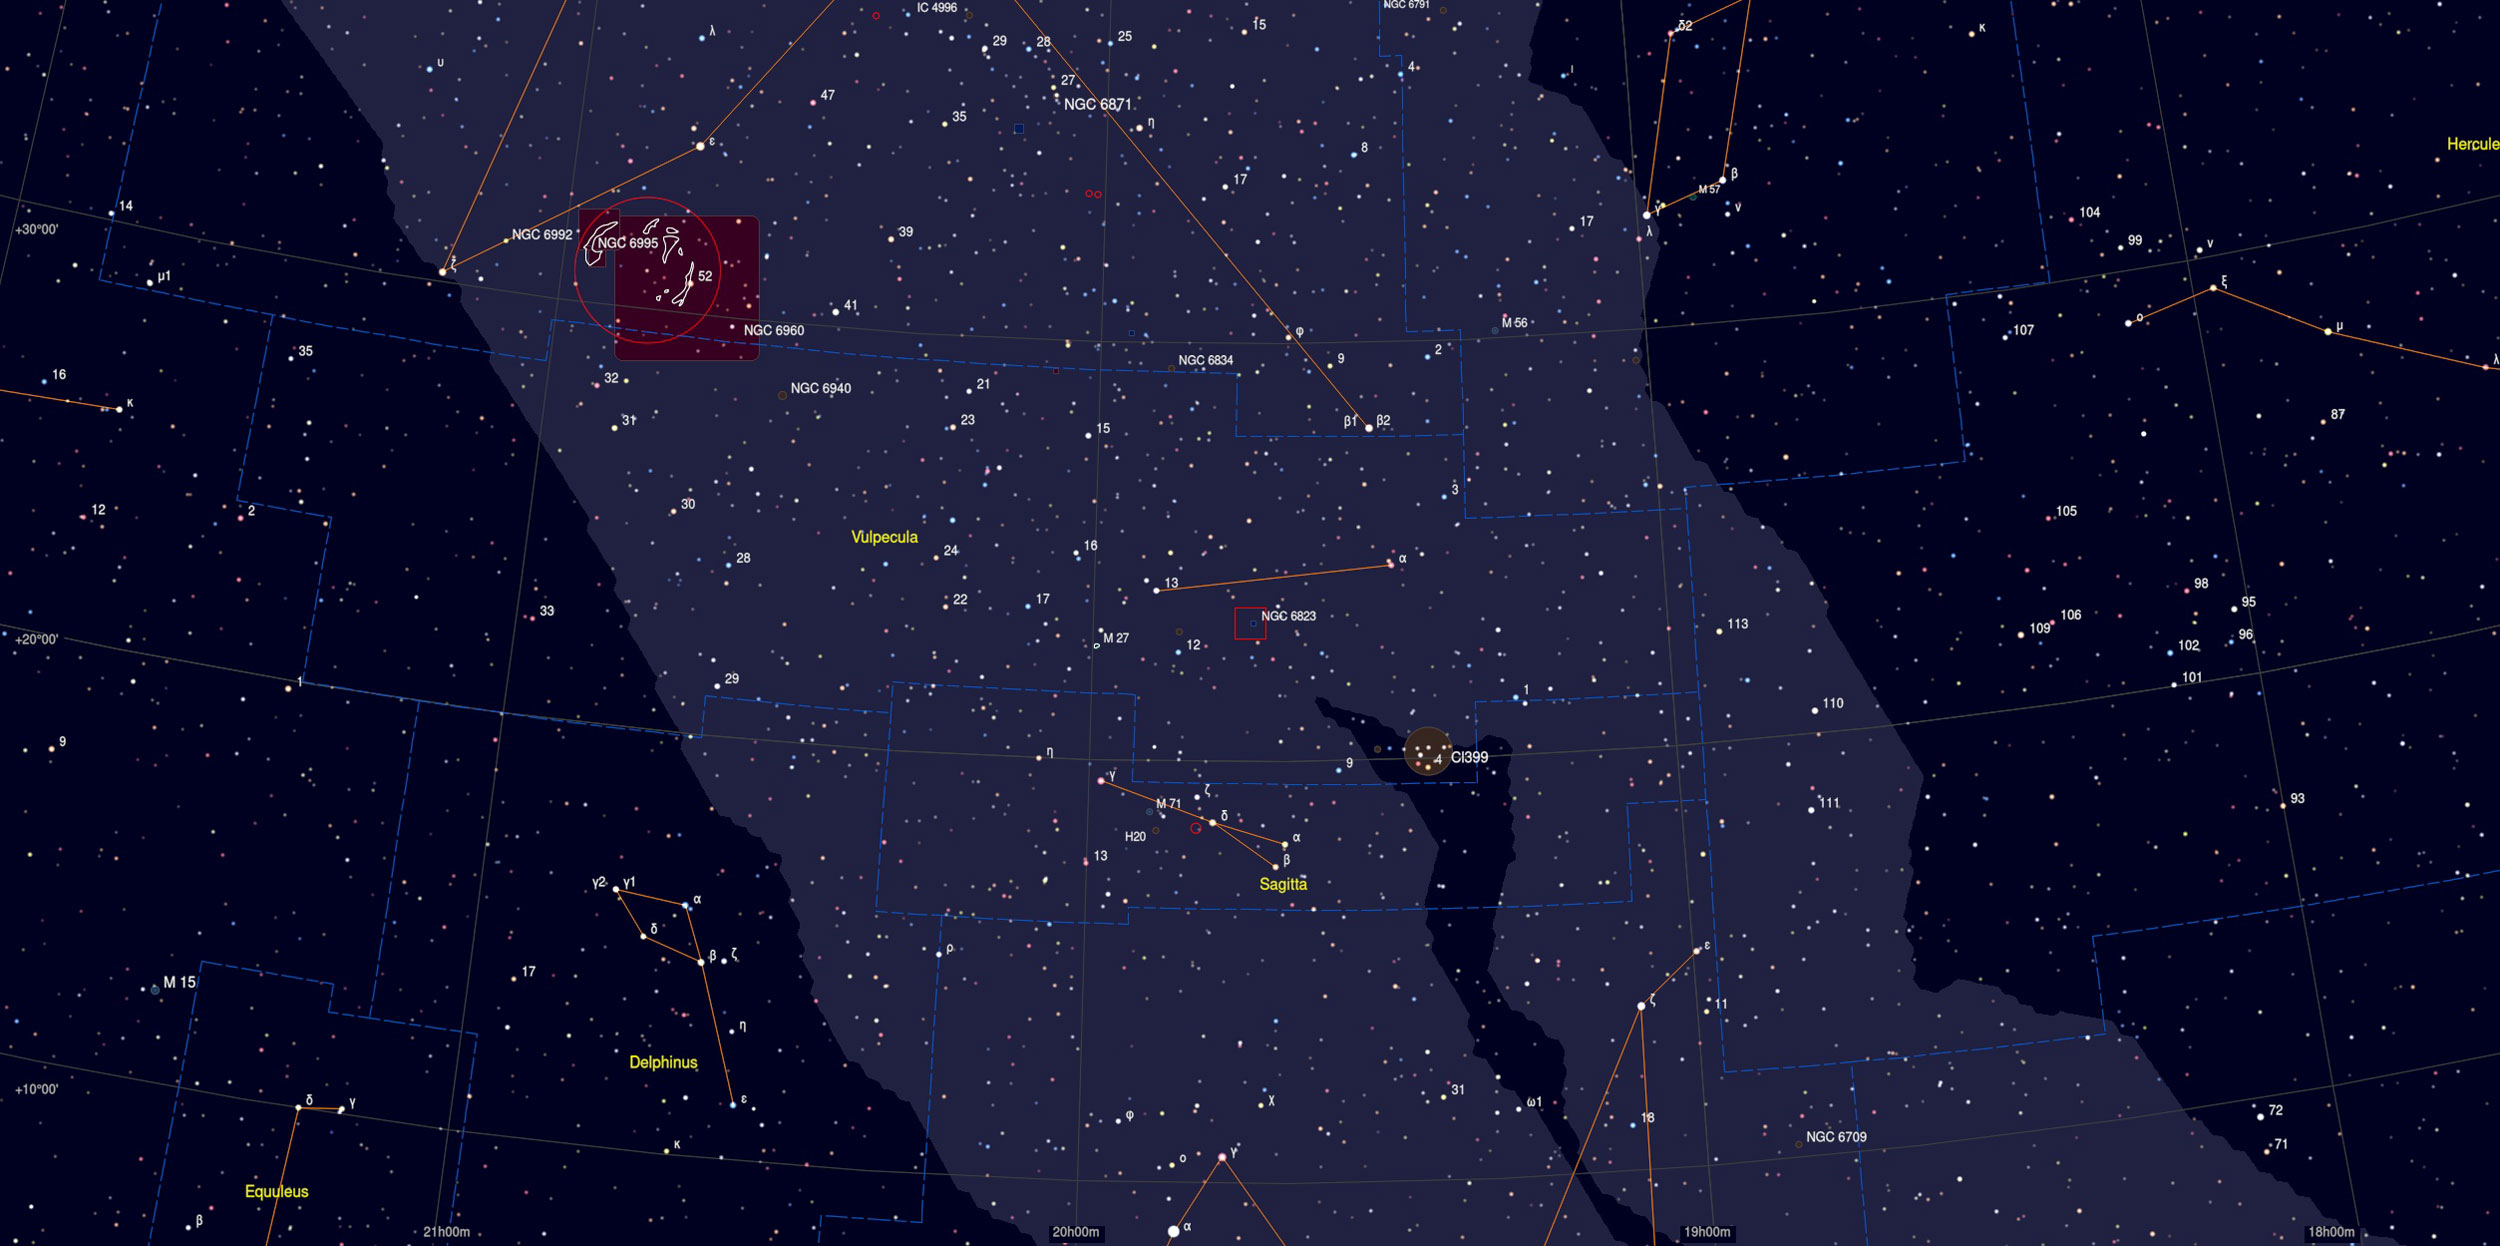 NGC 6823 Nebula Sky Chart - Astrophotography Martin Rusterholz